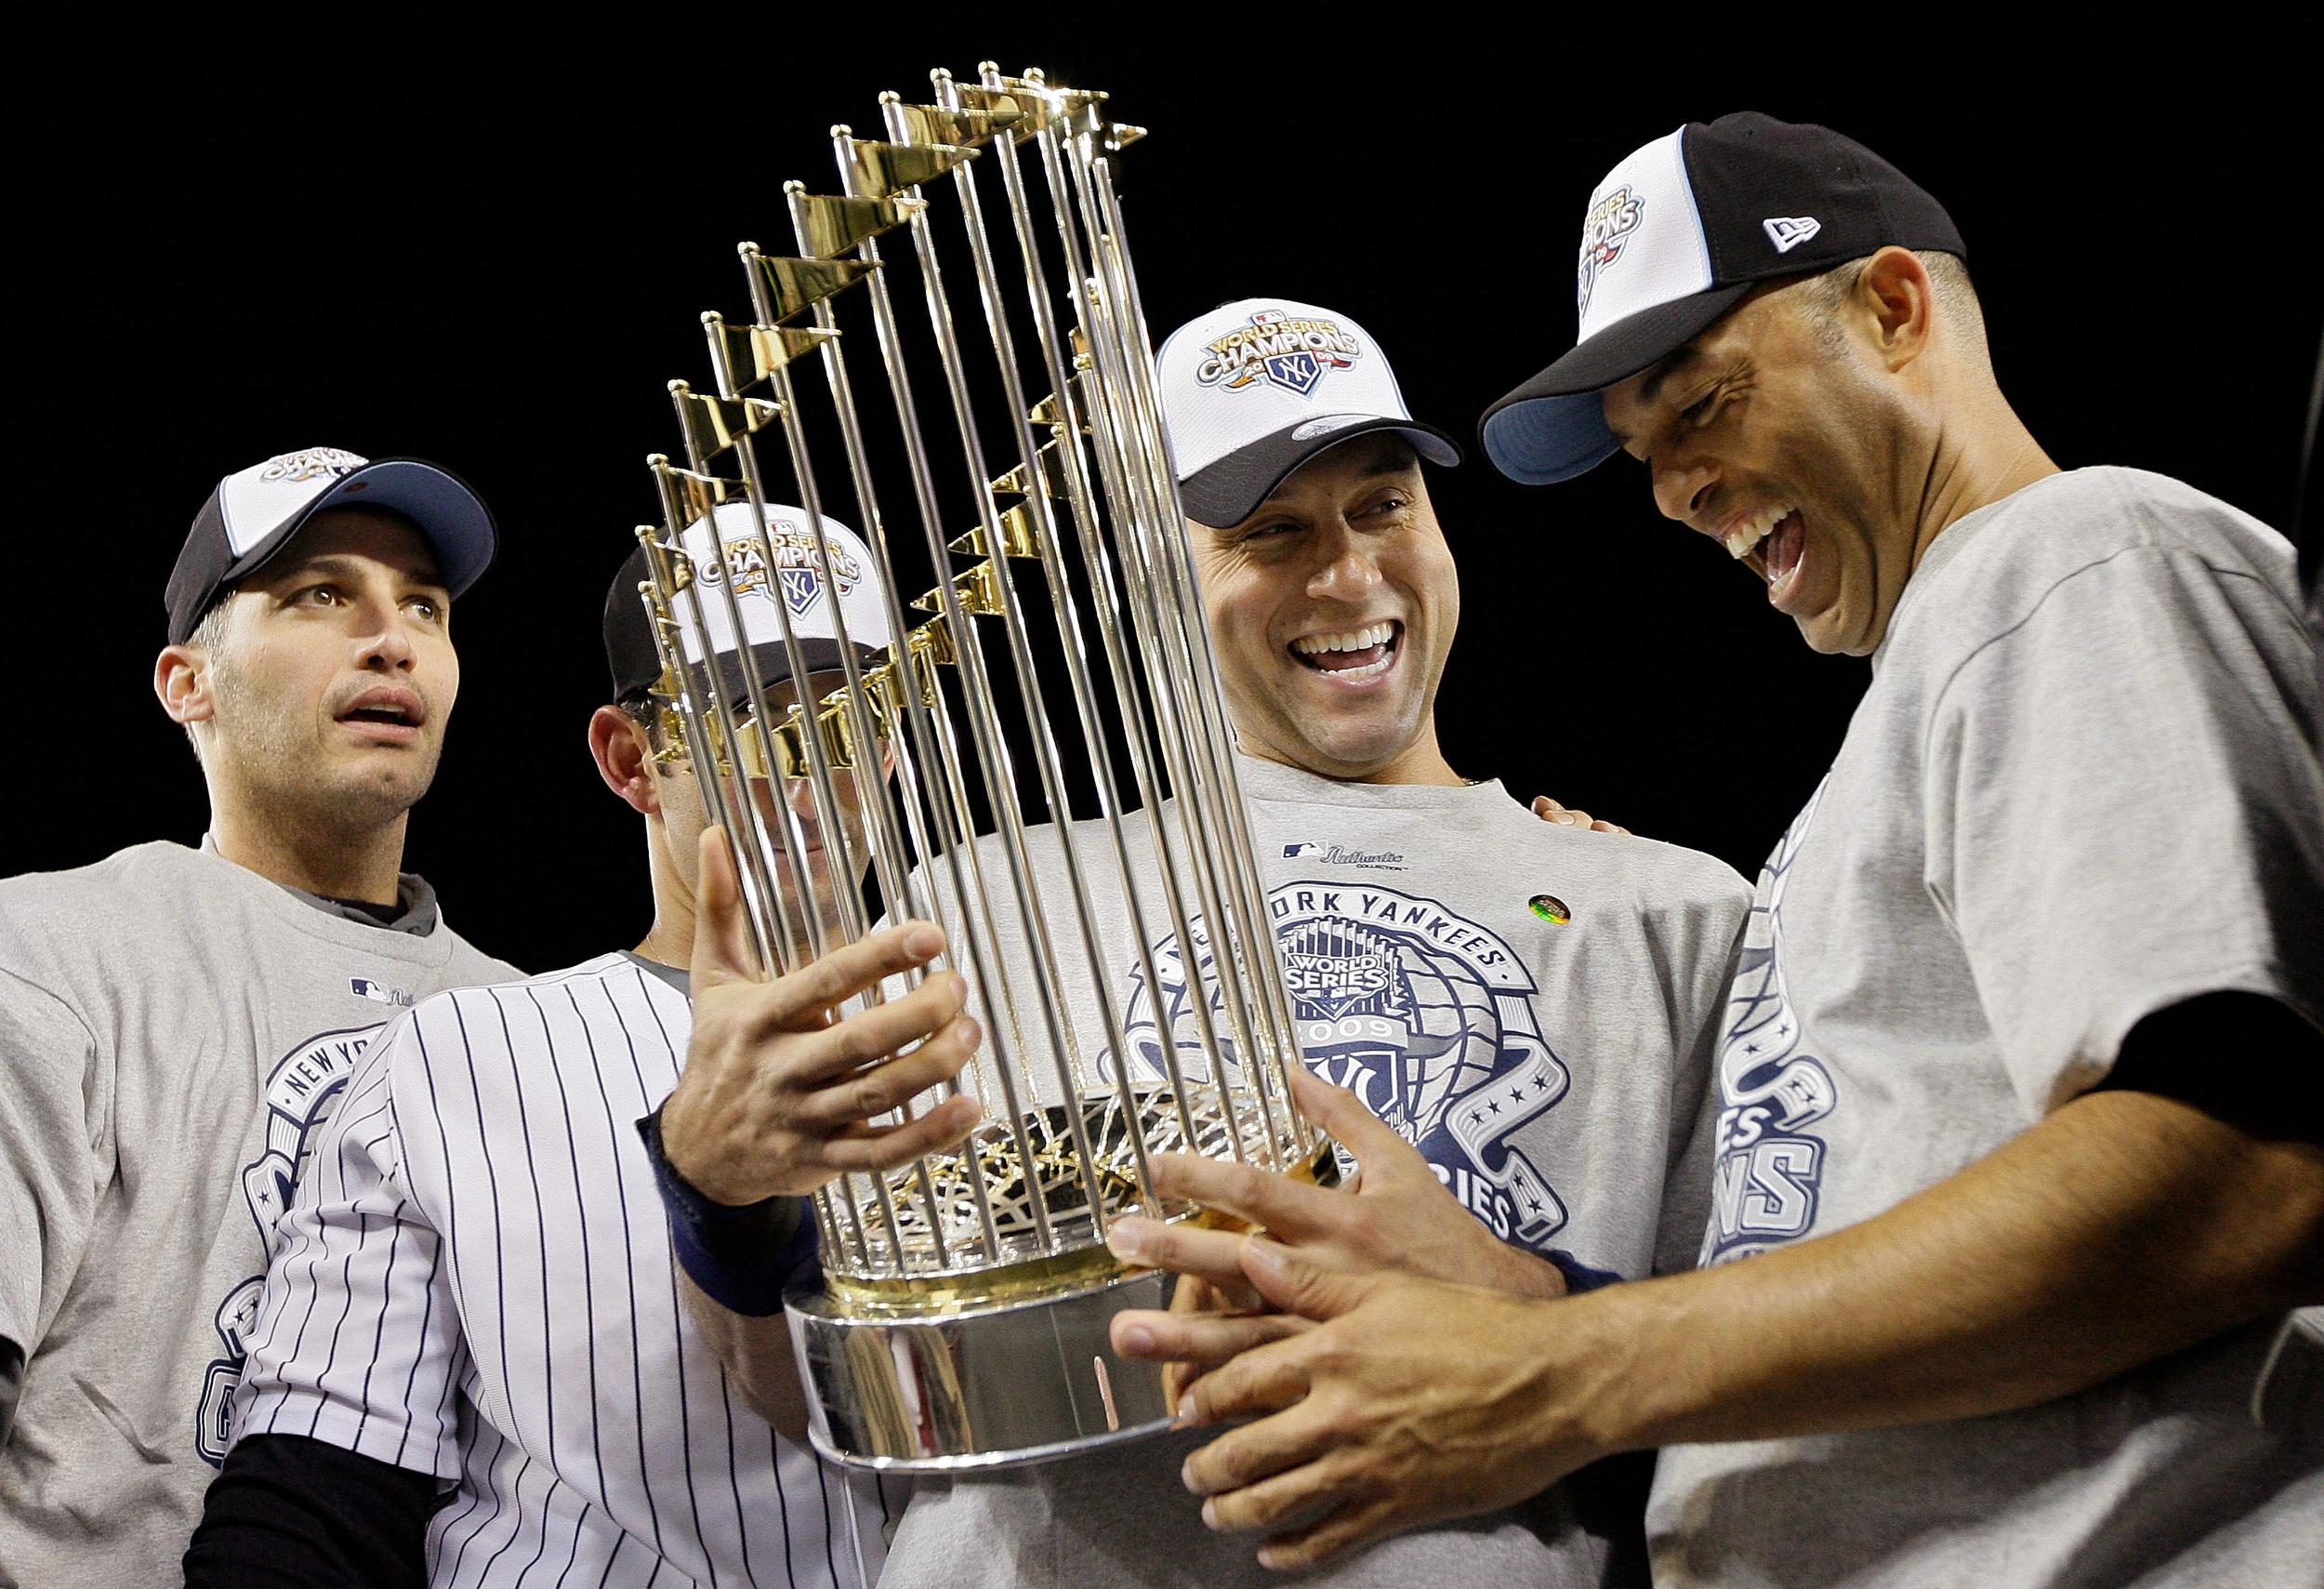 World_Champions_2009_Yankees.jpg